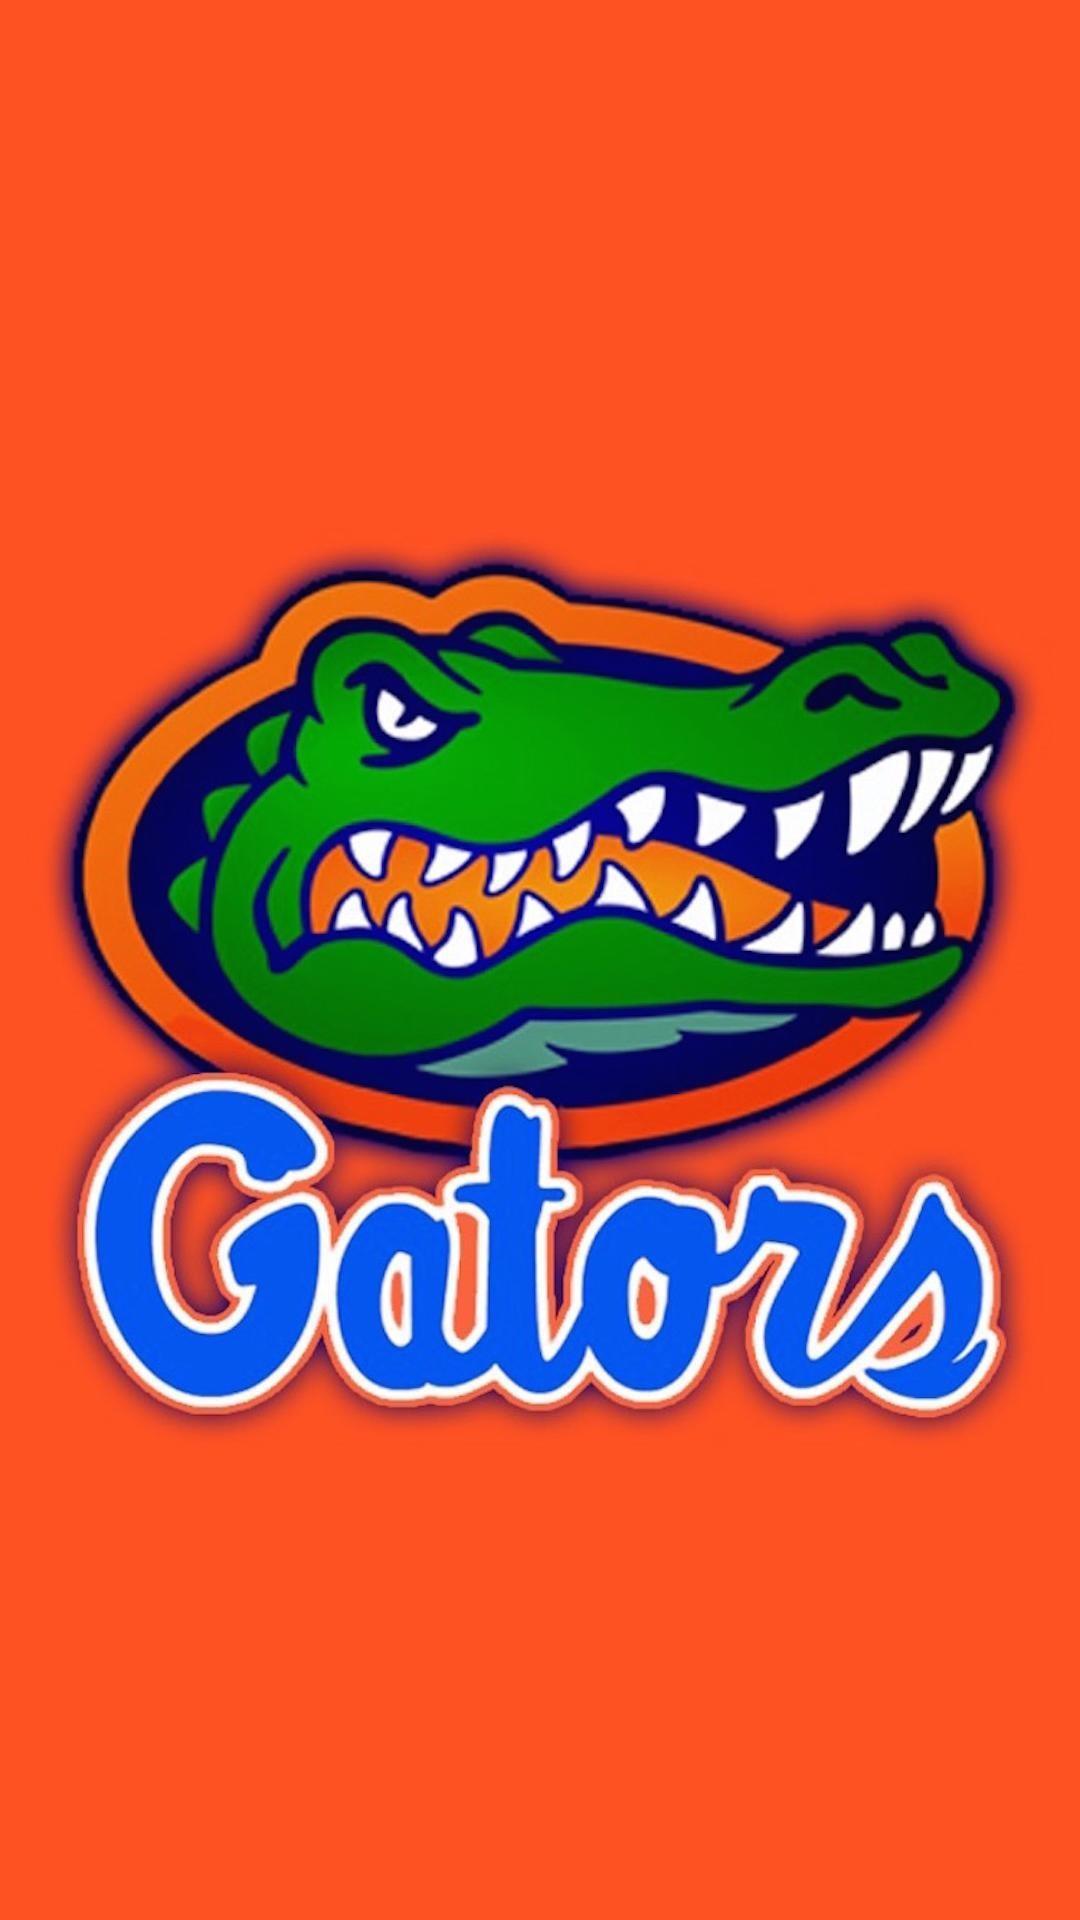 Florida Gators Wallpaper Iphone 67 Images